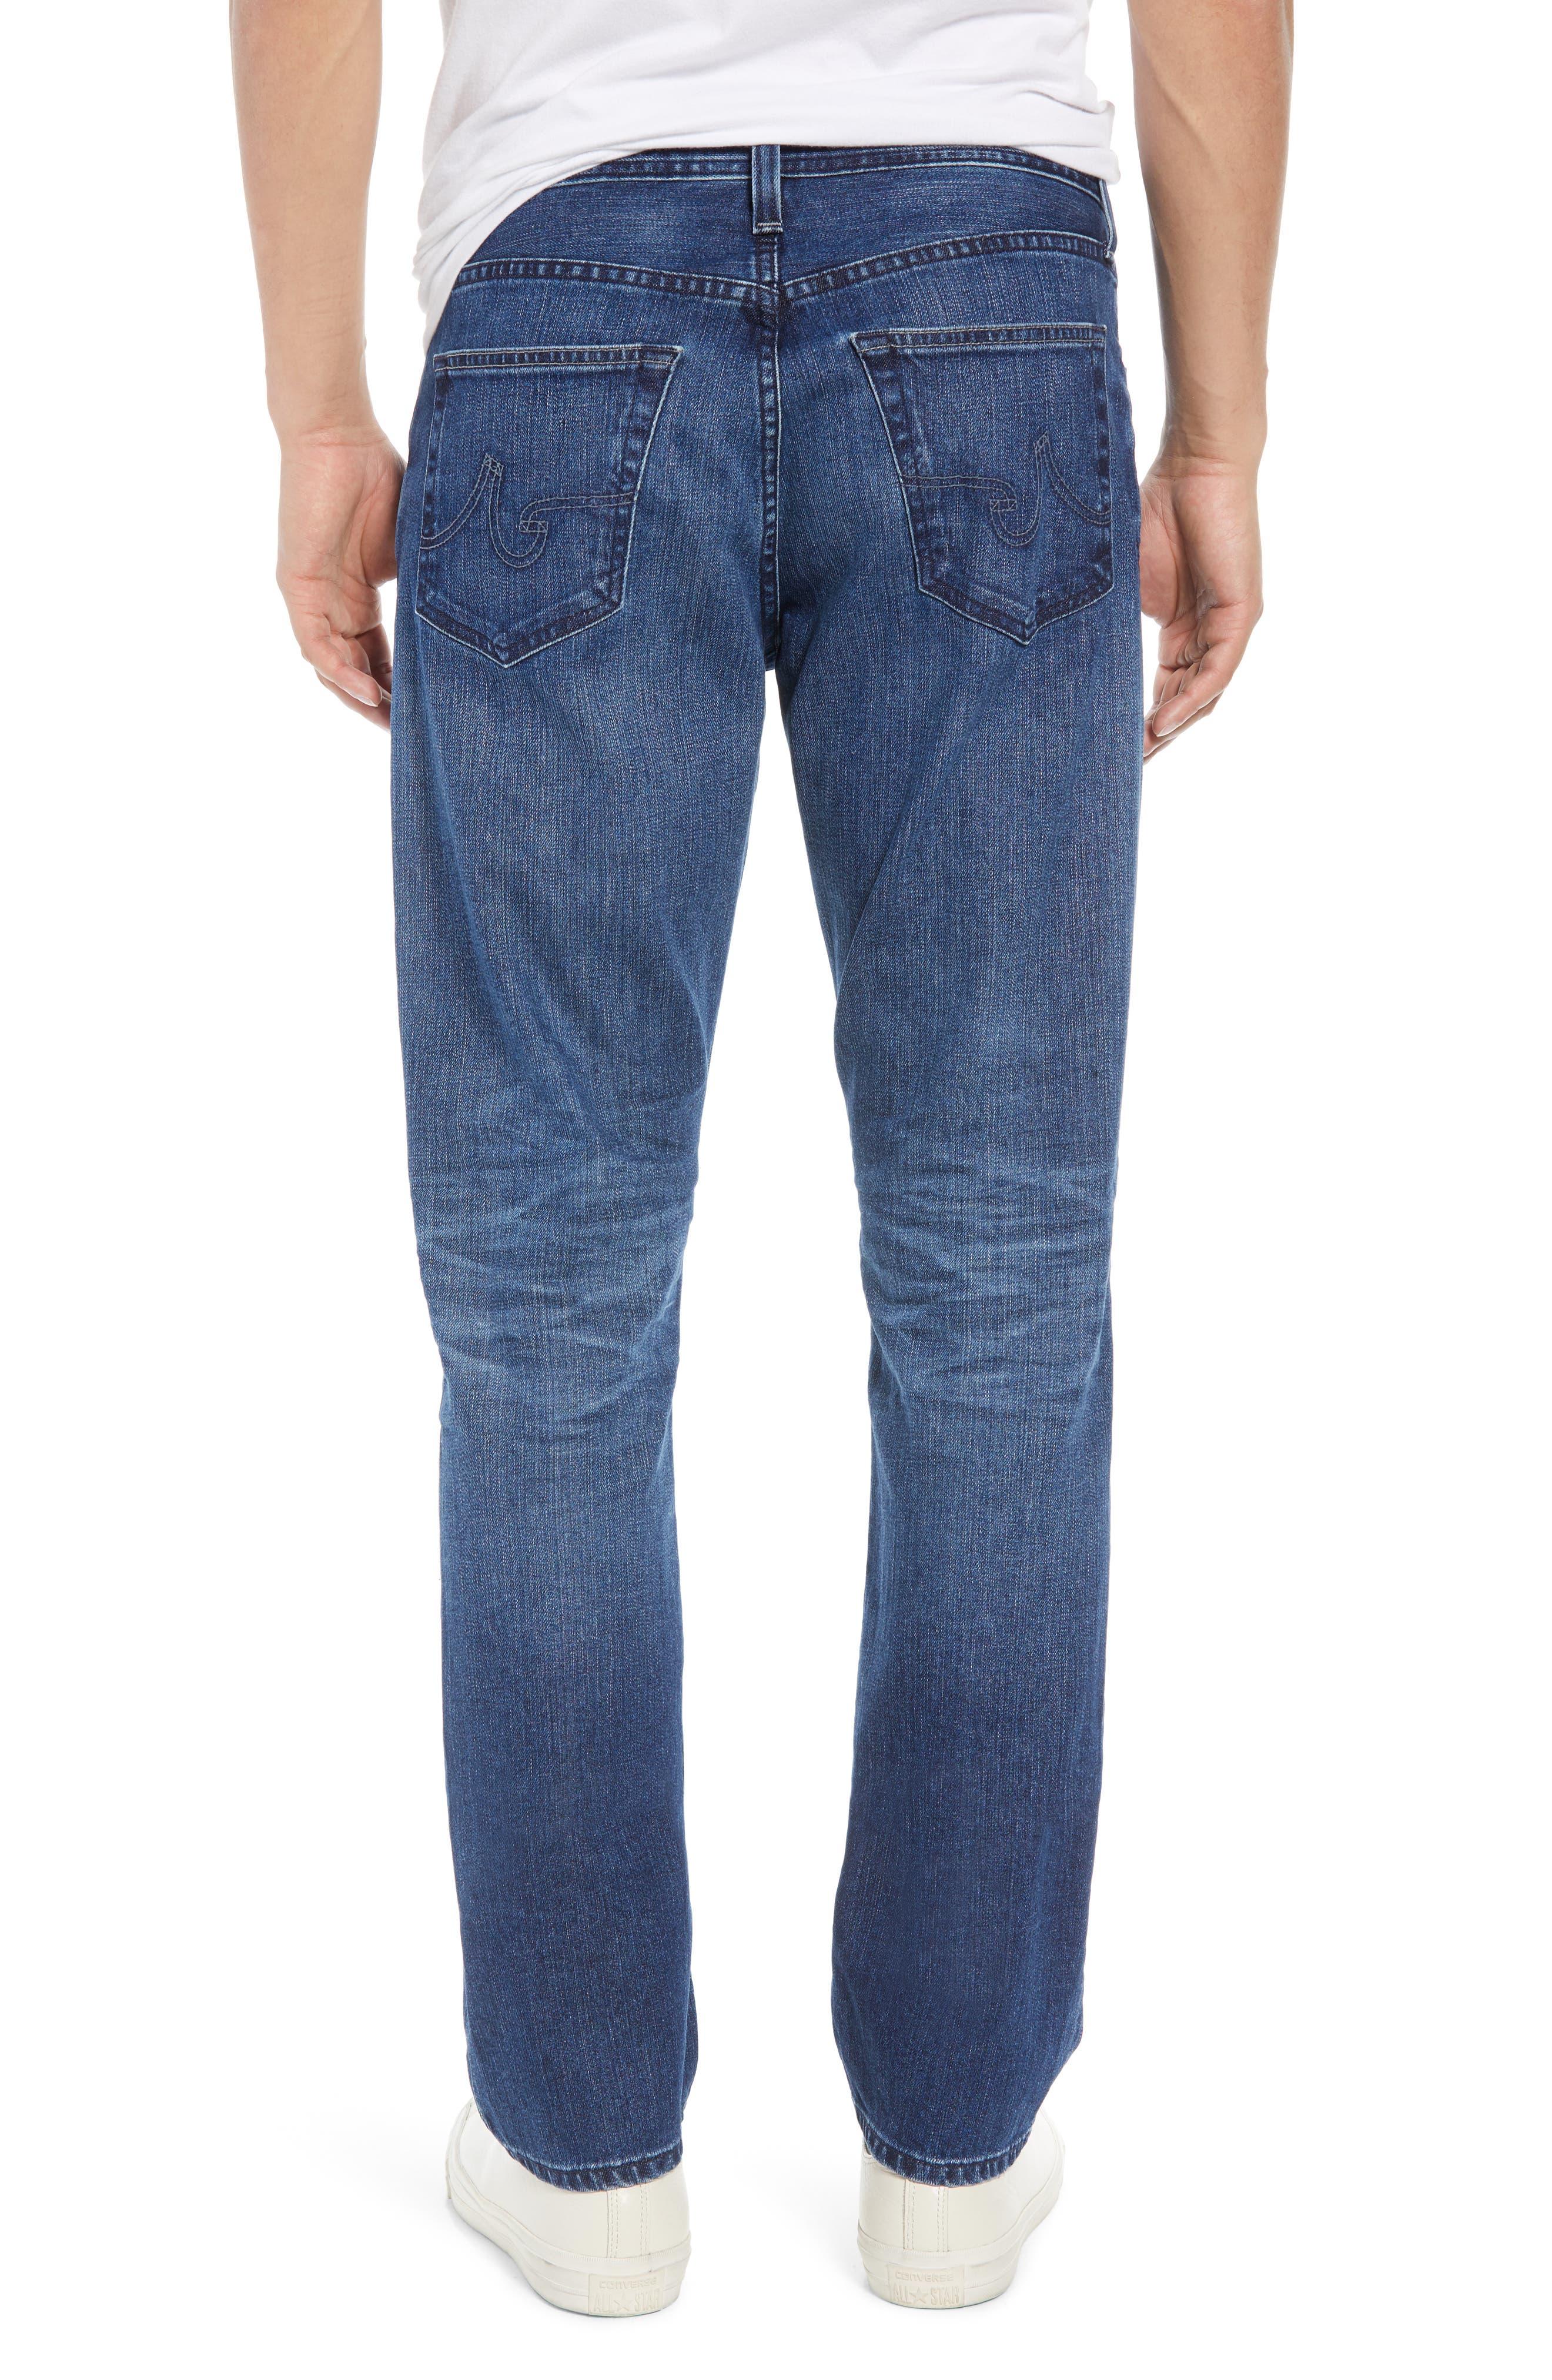 Everett Slim Straight Leg Jeans,                             Alternate thumbnail 2, color,                             9 YEARS SEQUENCE